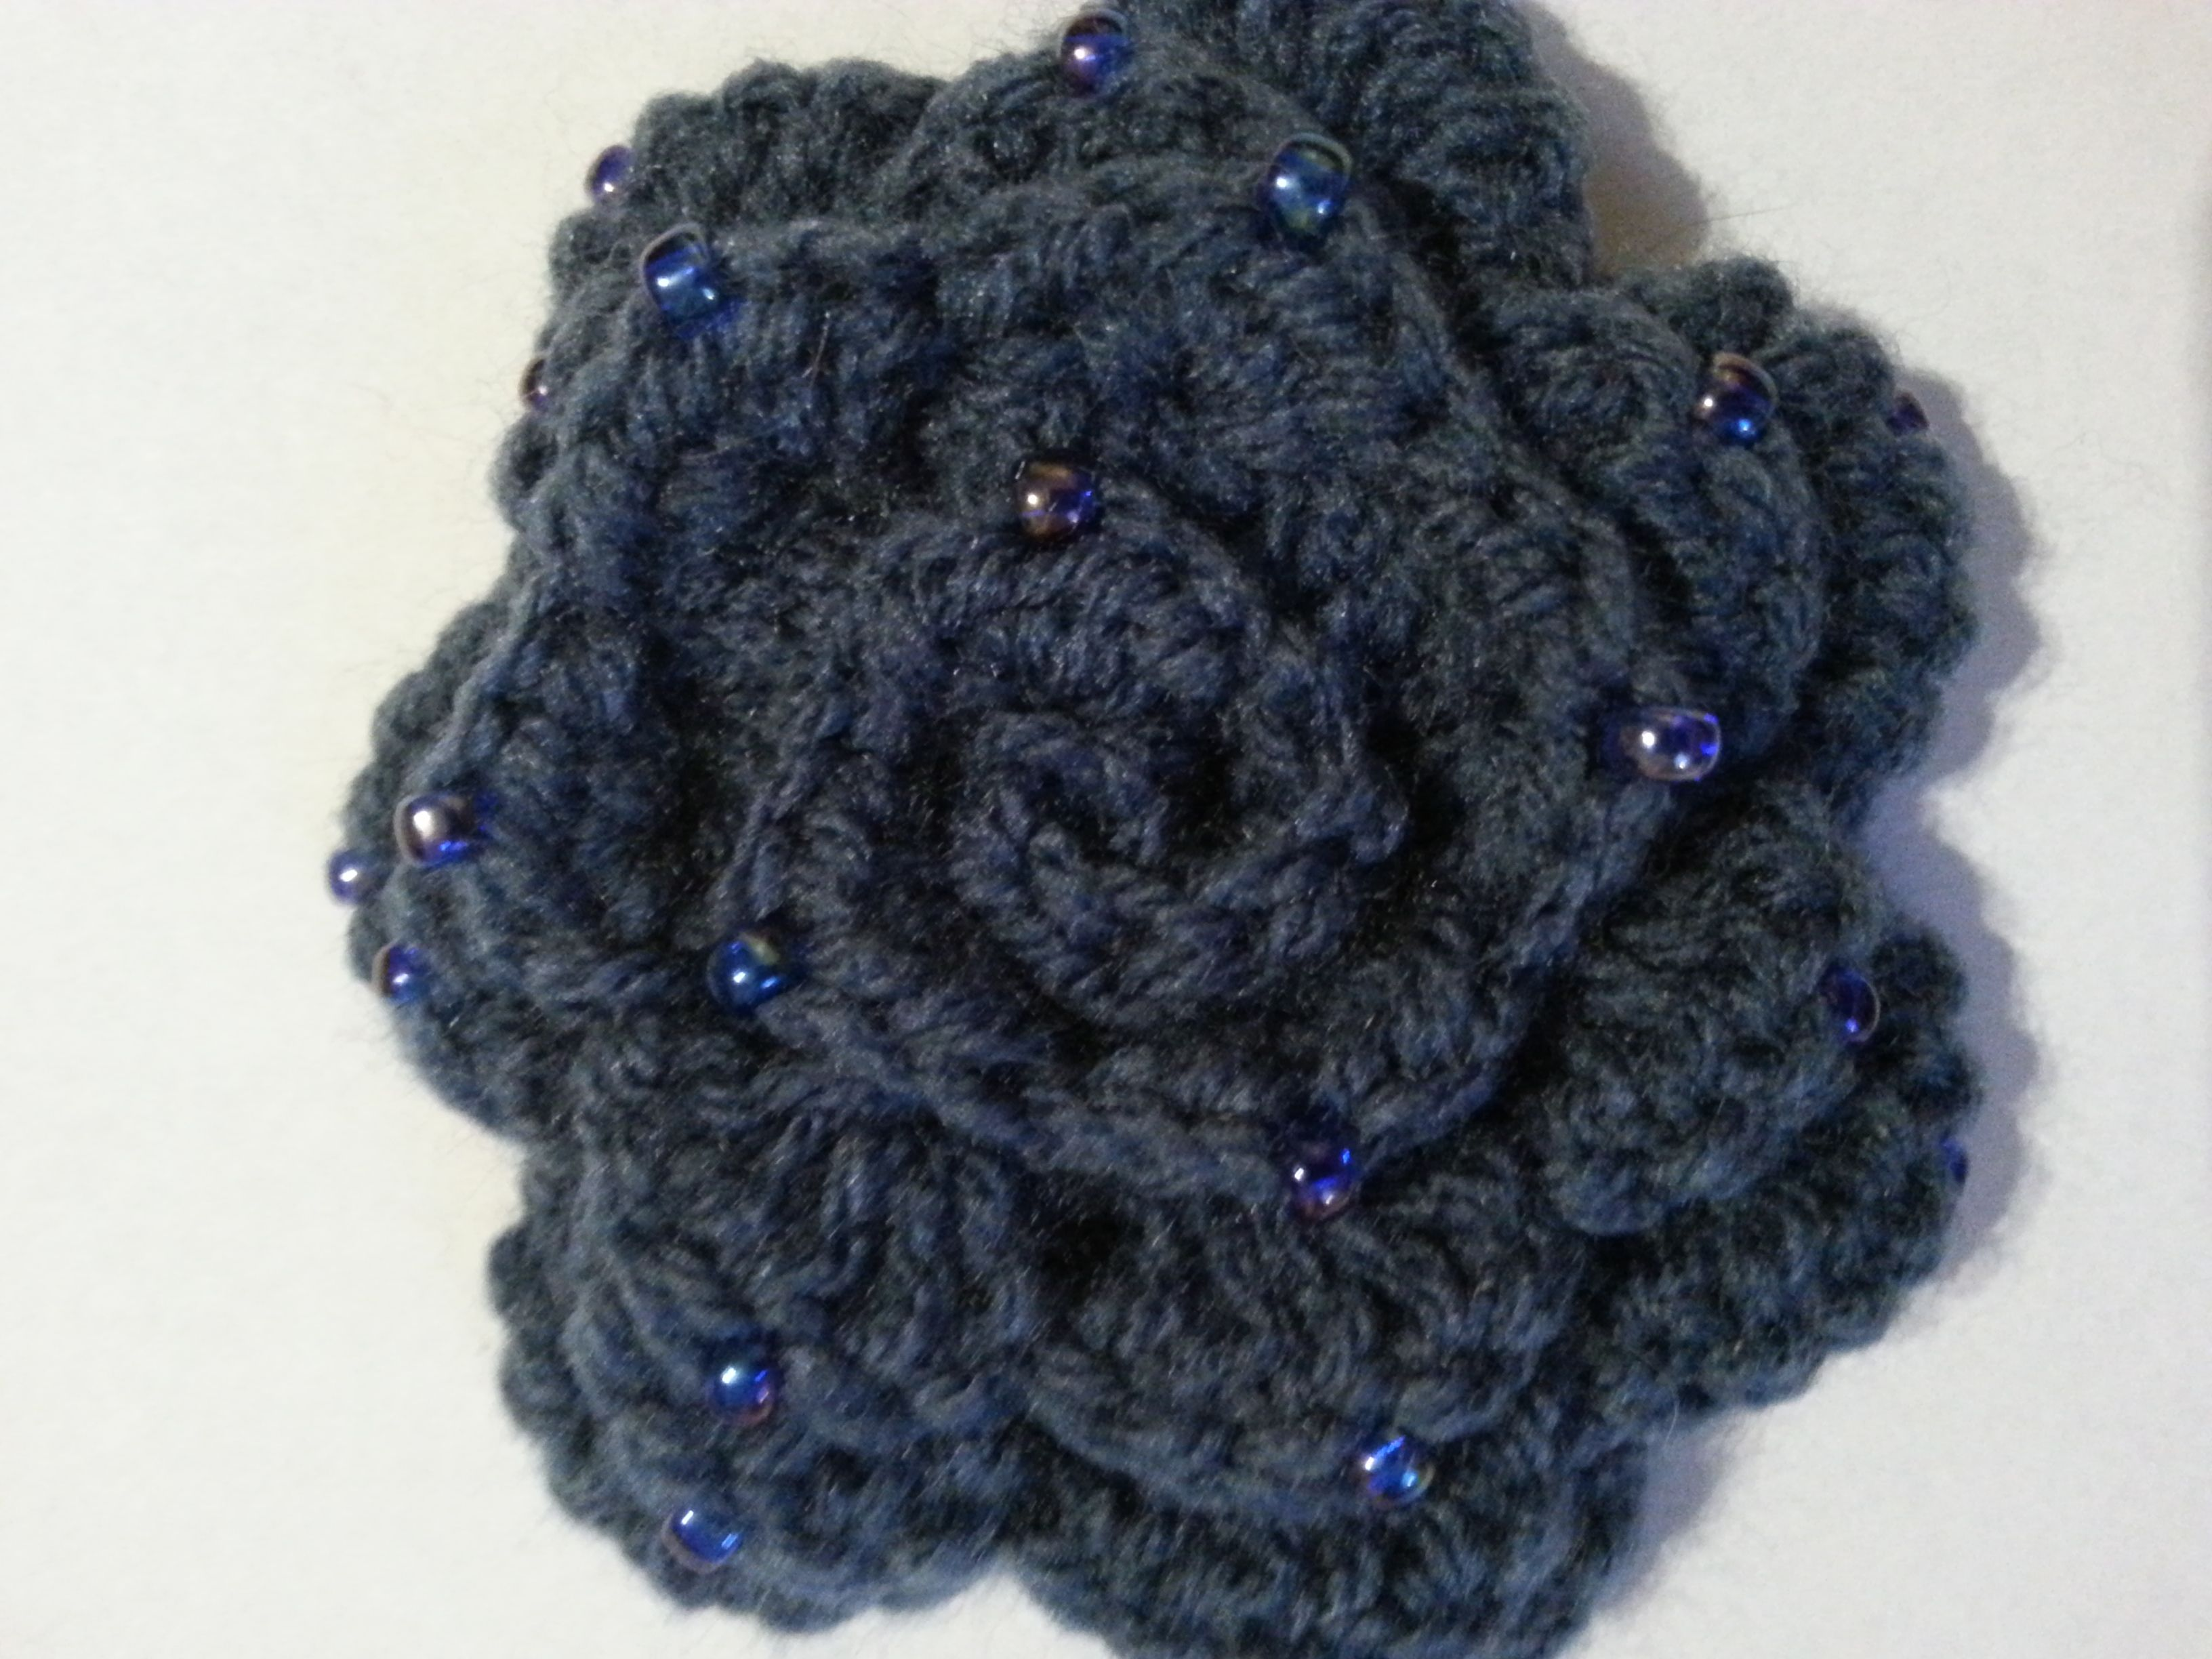 broszka róża na szydełku, crochet rose brooch, video tutorial ...